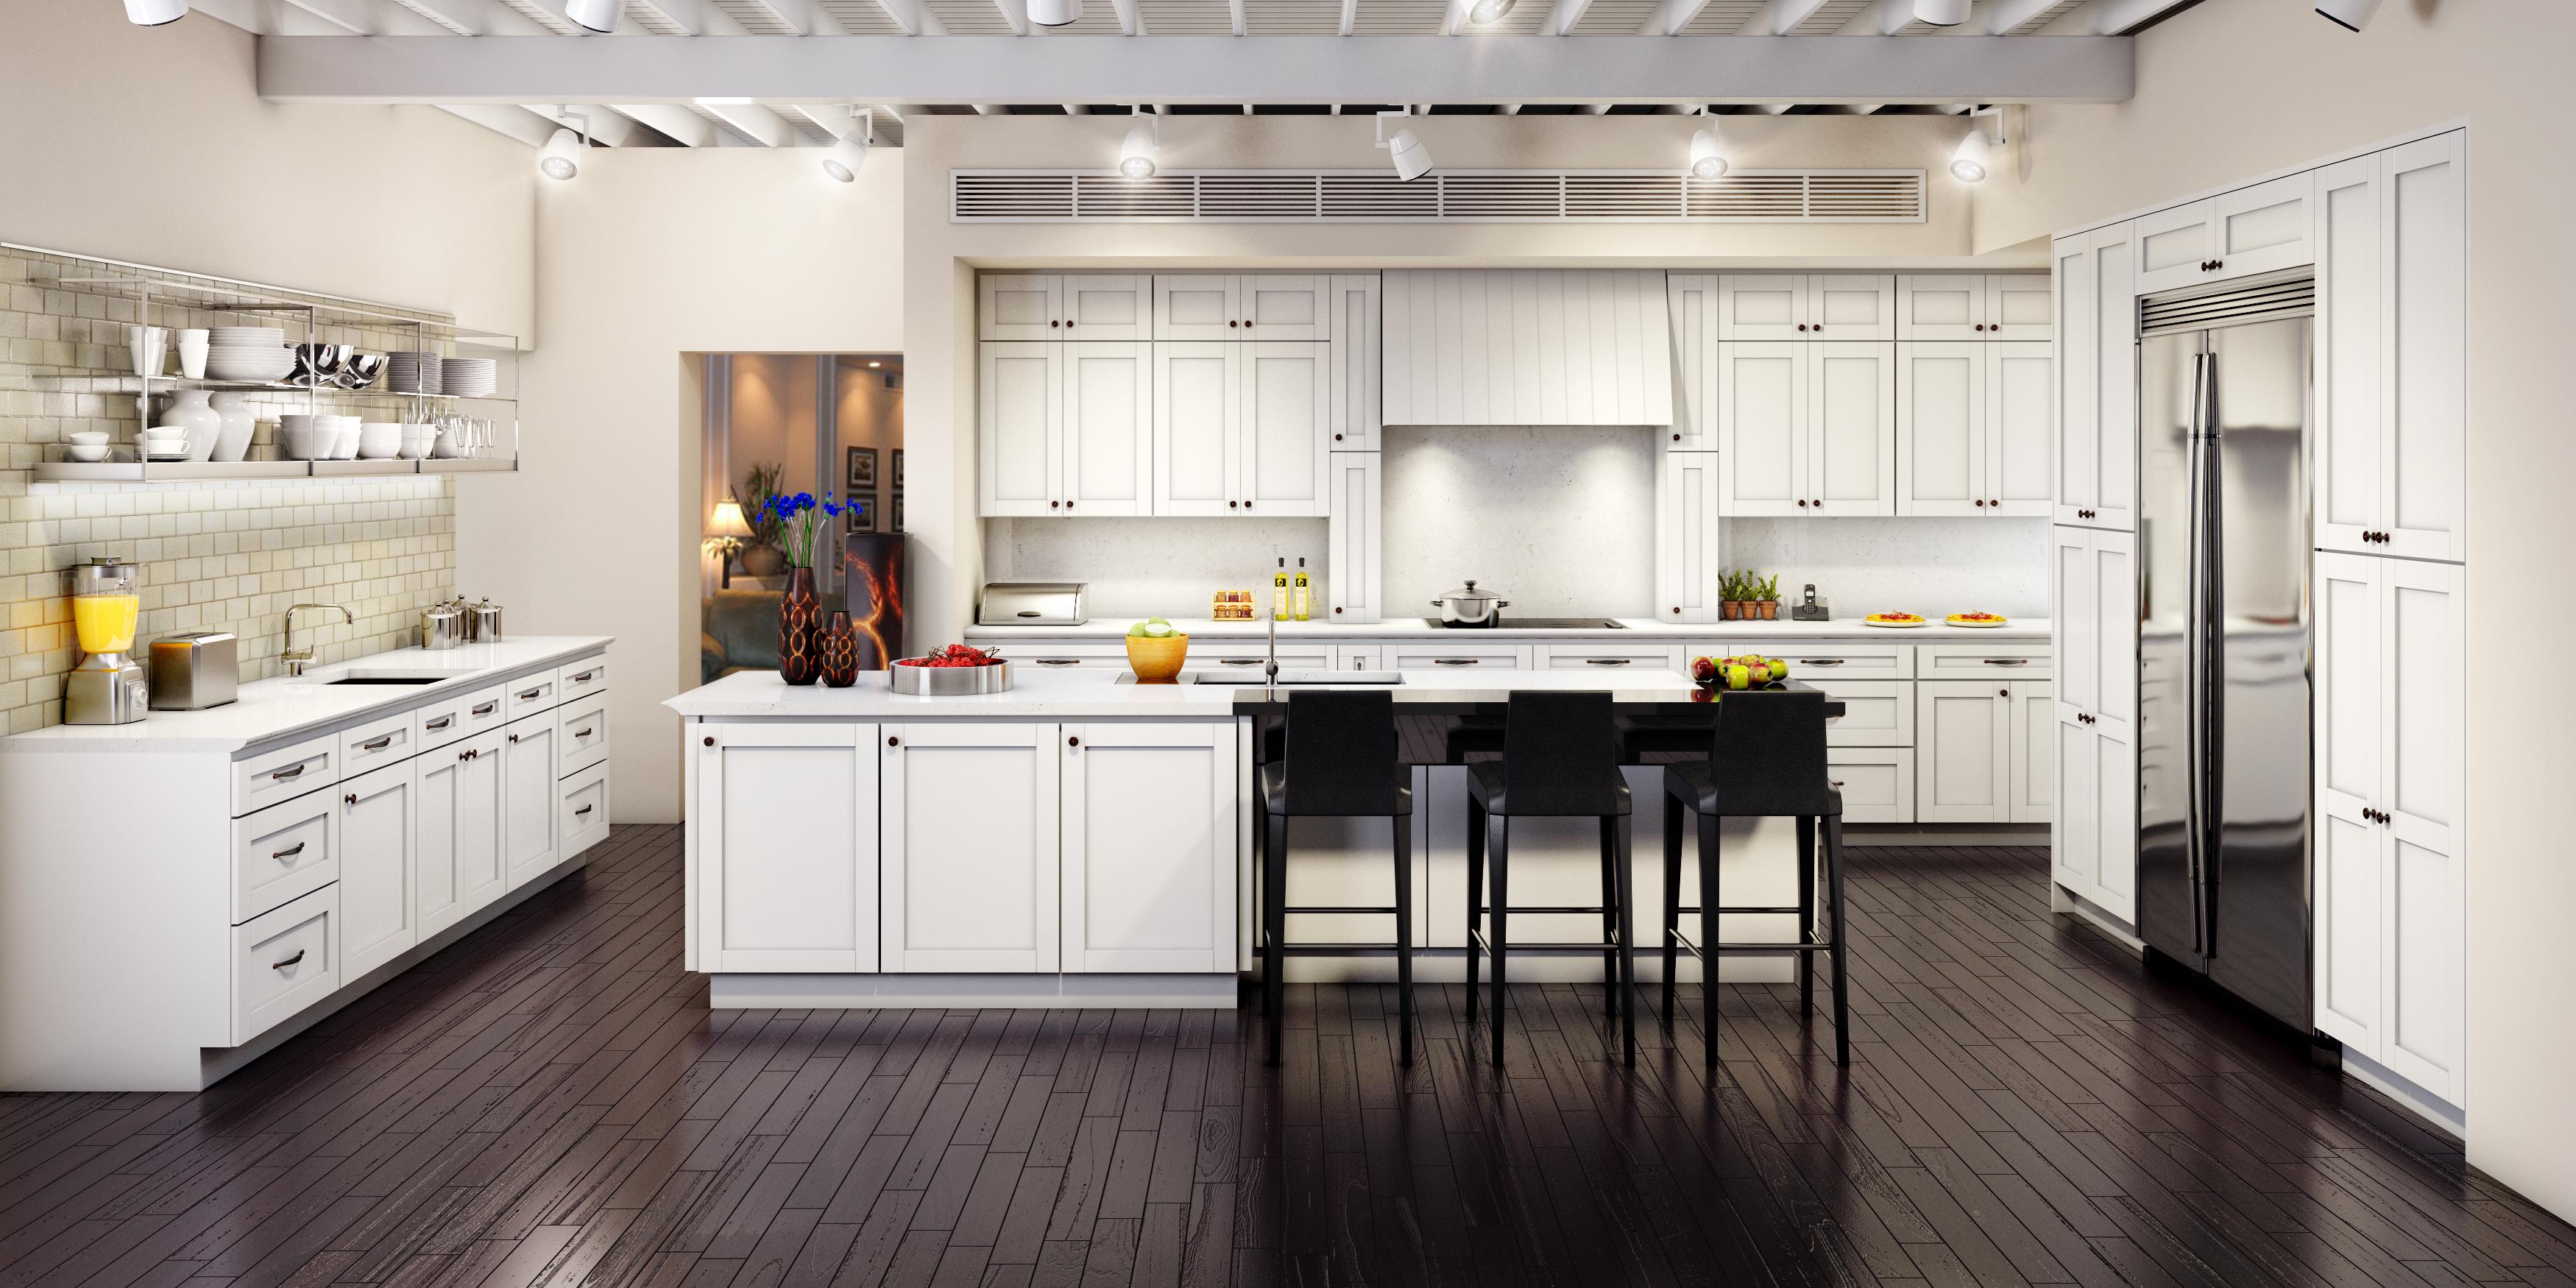 Mayland Cabinets – U.S. Leading Cabinets Manufacturer   Coronado ...